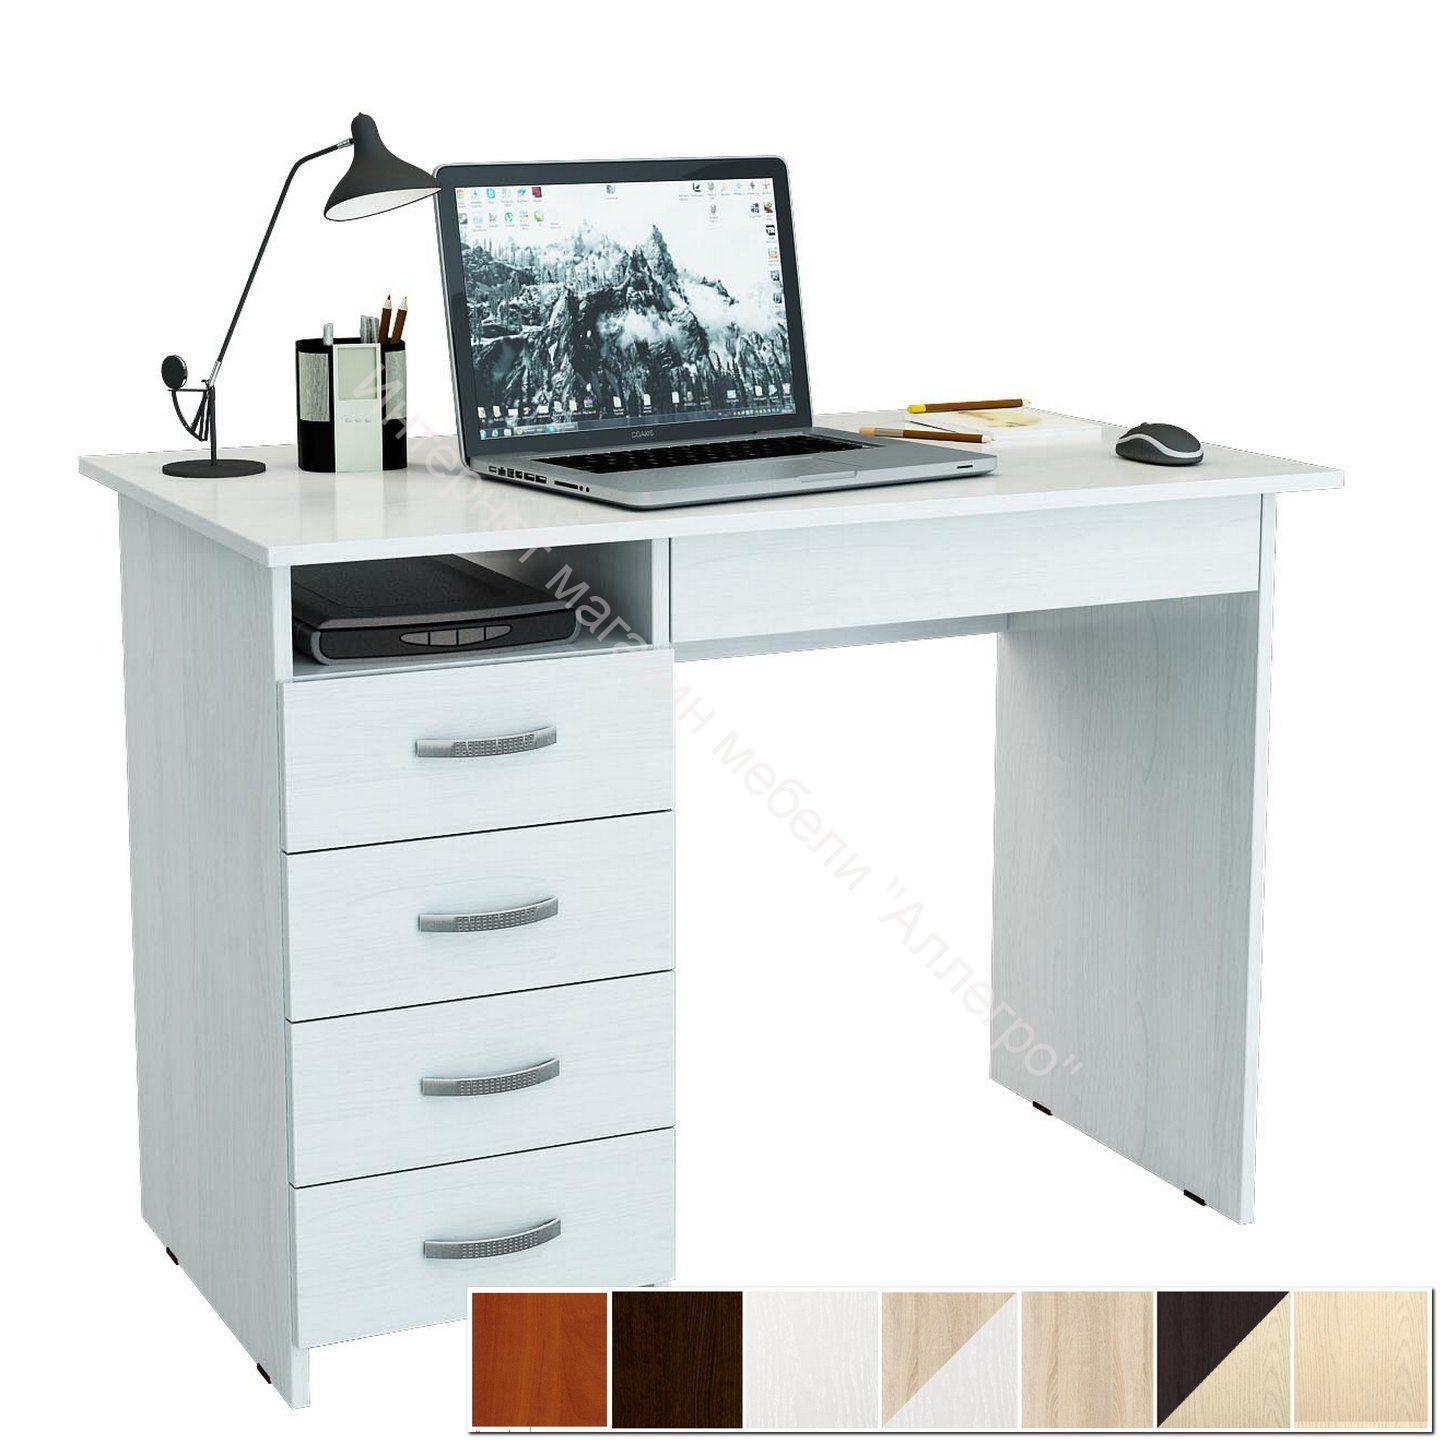 Стол компьютерный Милан-1 (0120)